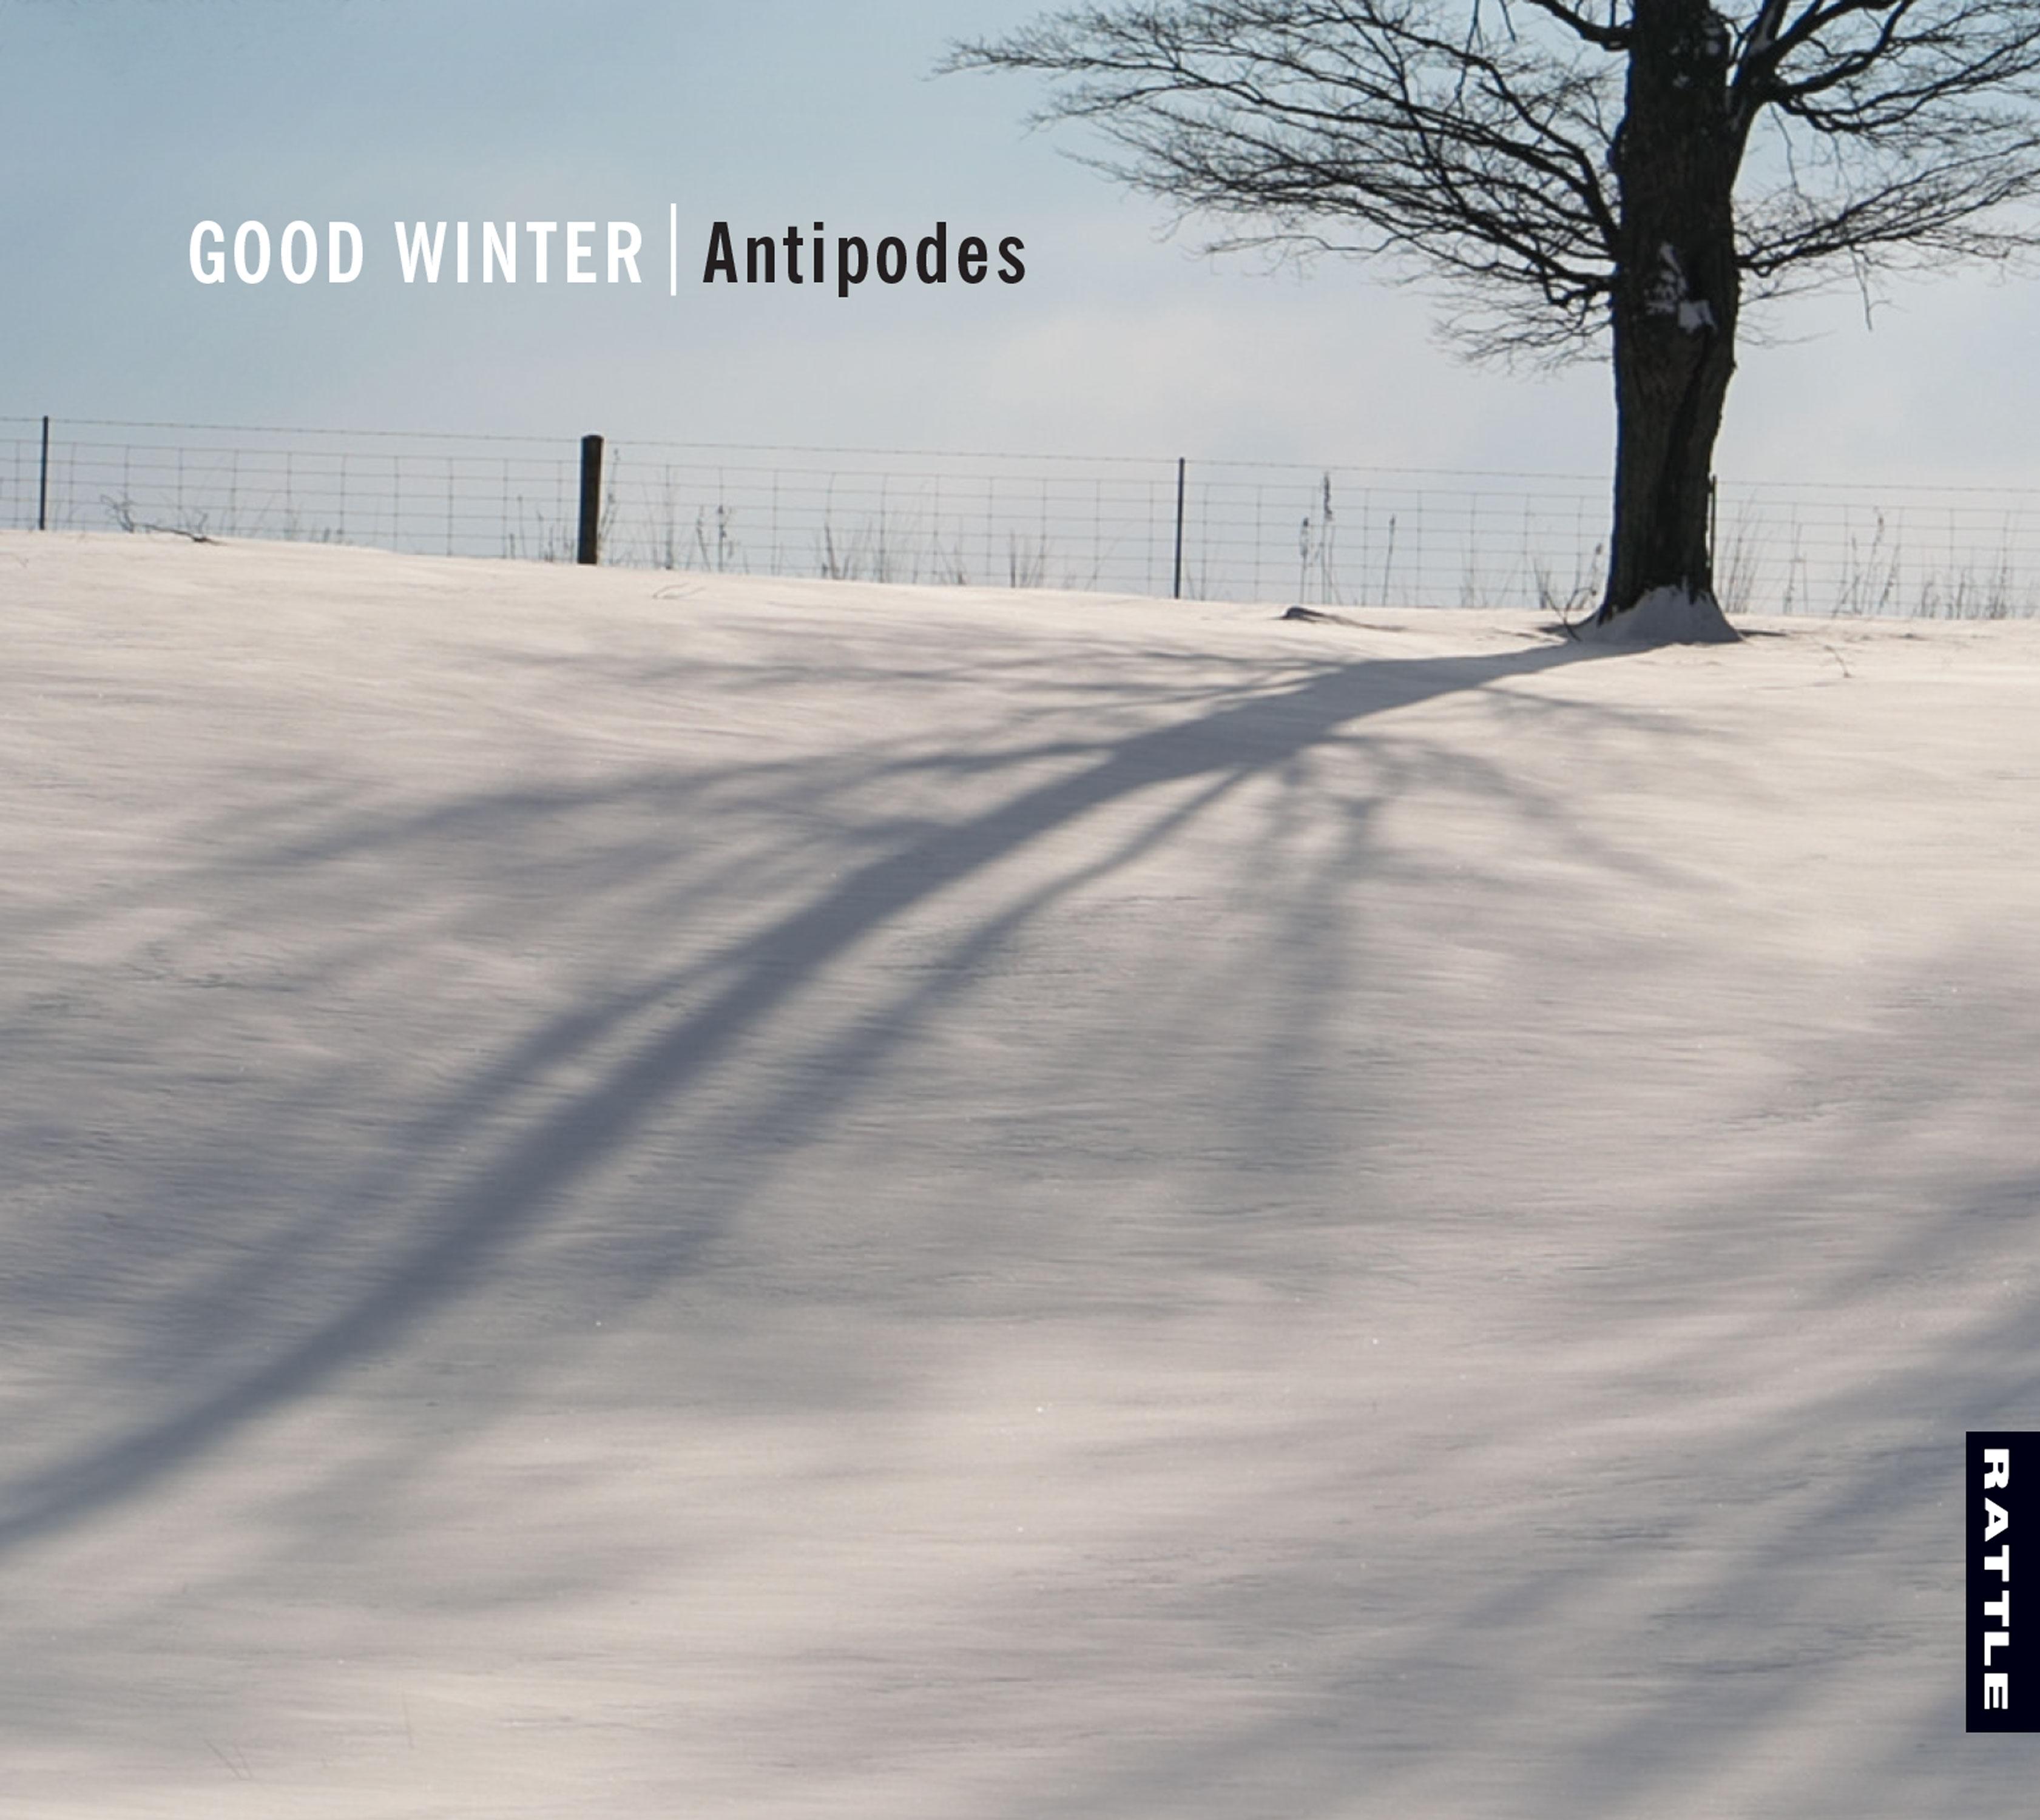 Antipodes | Good Winter - downloadable MP3 ALBUM